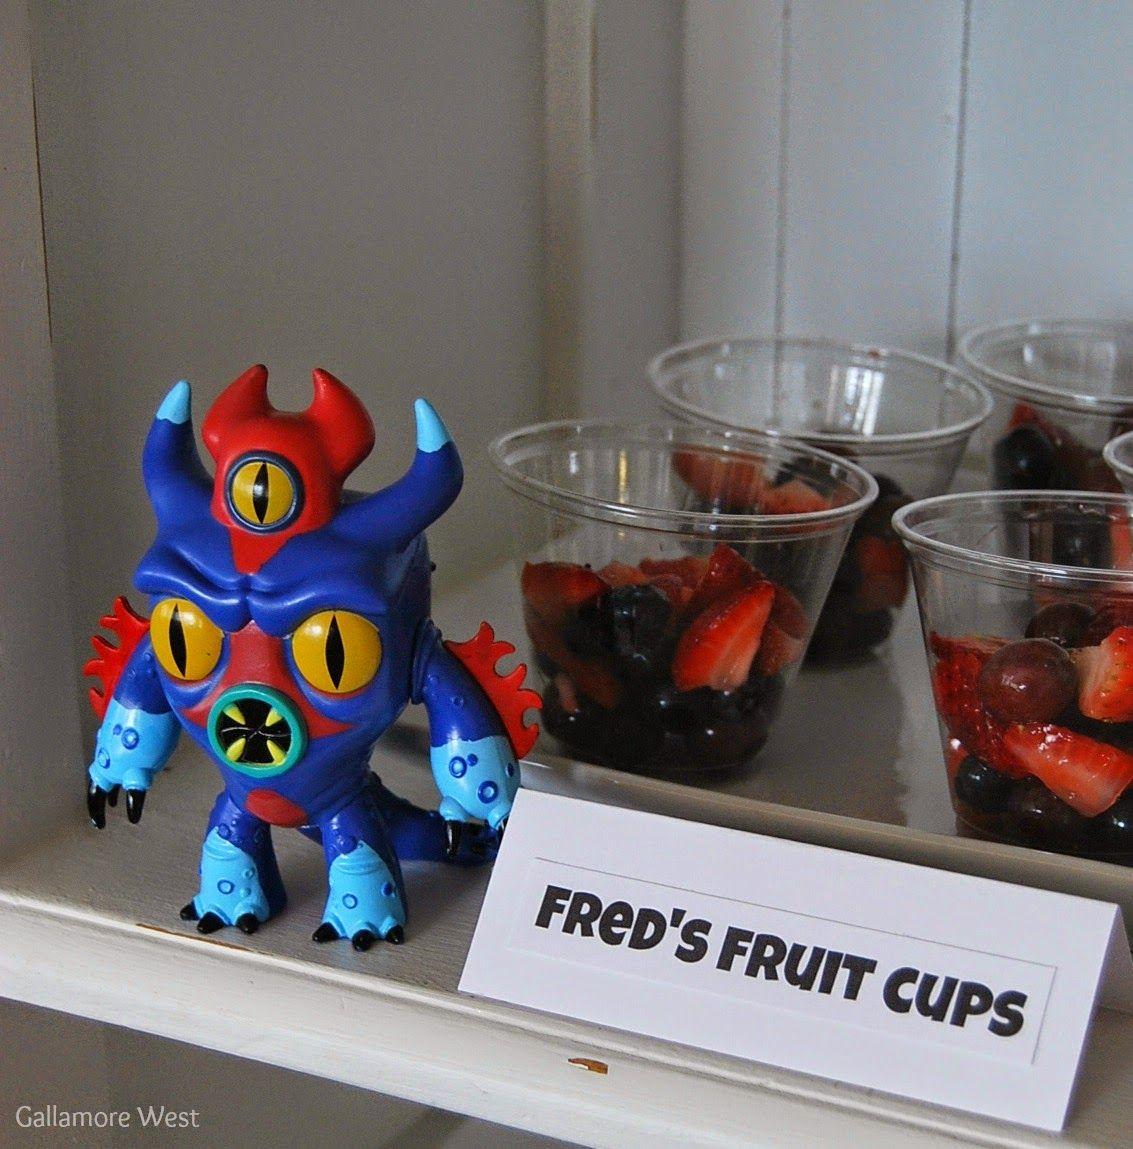 Big Hero 6 Fred's Fruit Cups